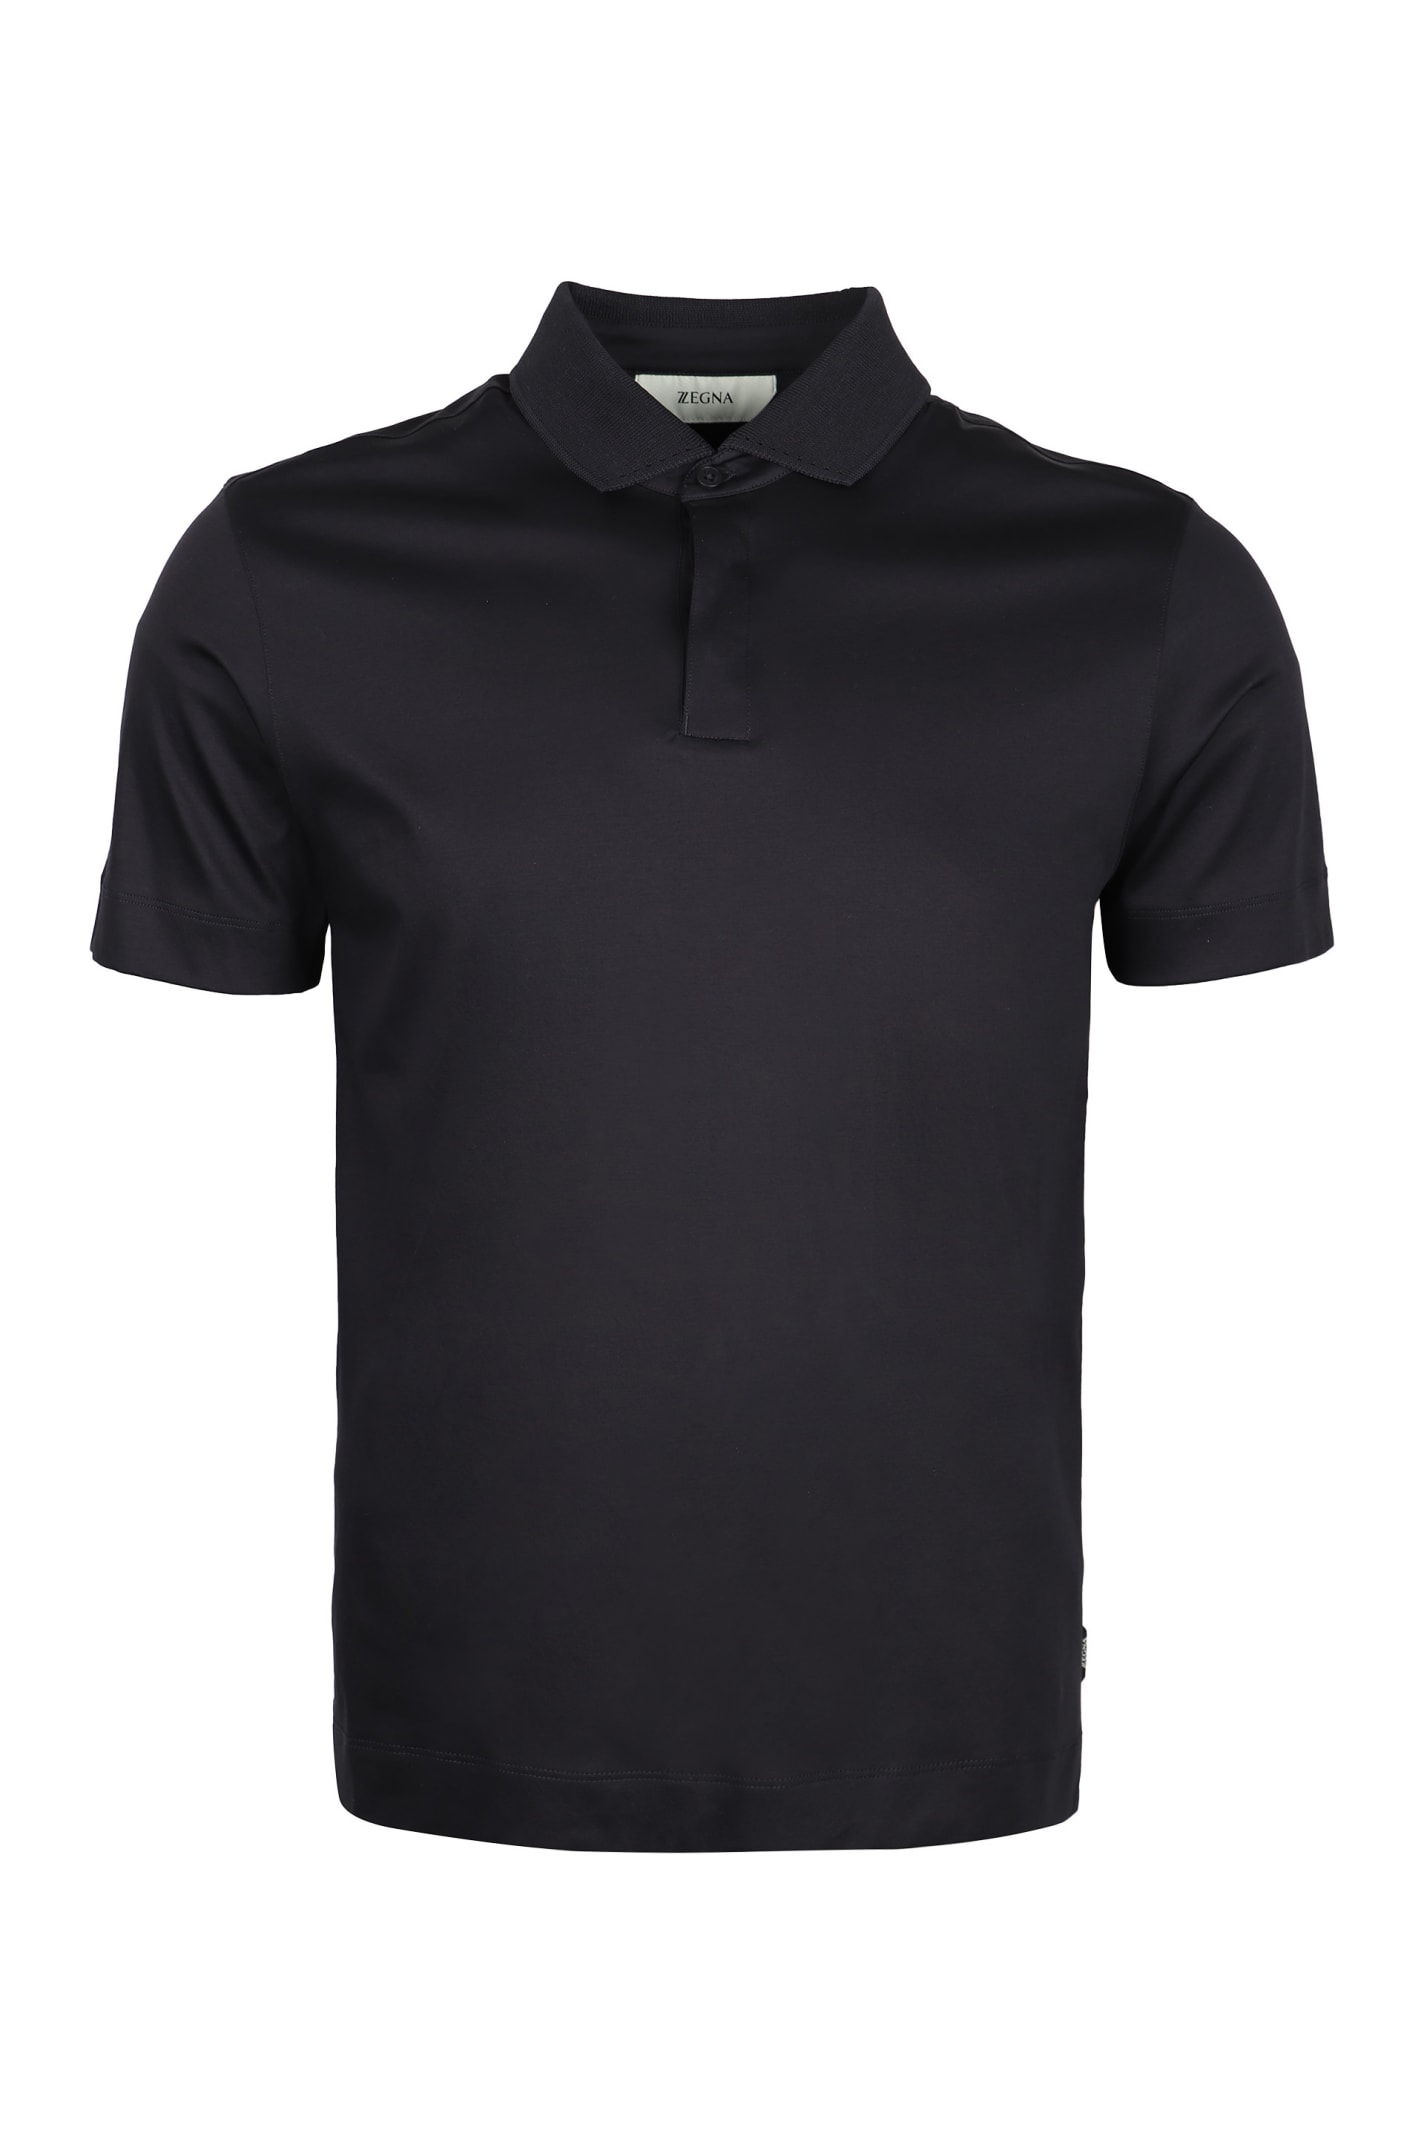 Z Zegna Short-sleeved Cotton Polo Shirt